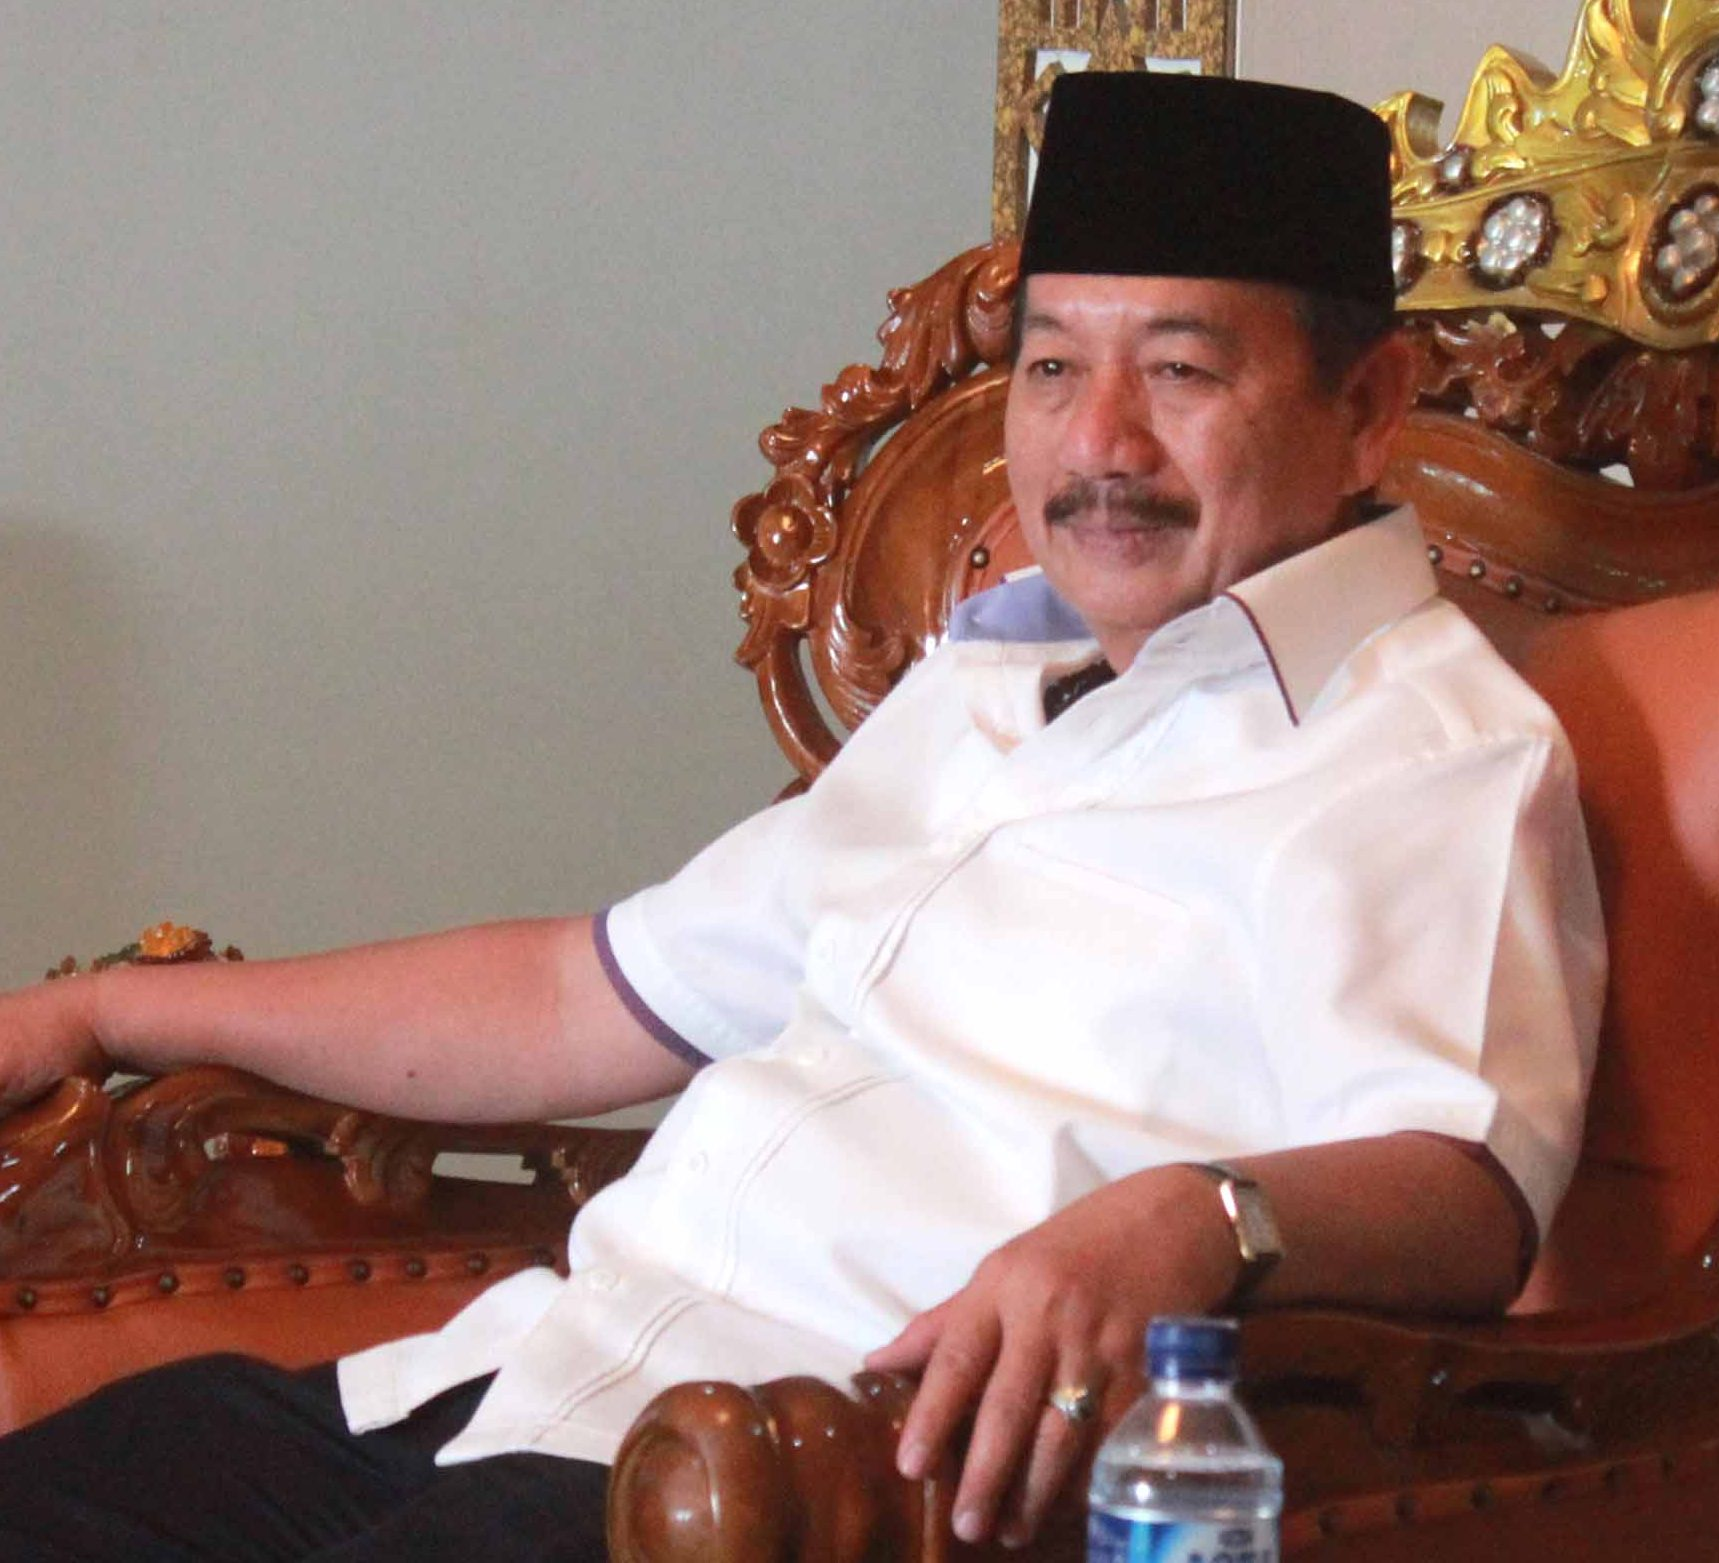 Wali Kota Bandarlampung bersantai di rumah dinasnya yang baru, (Foto Lampungnews/El Shinta)